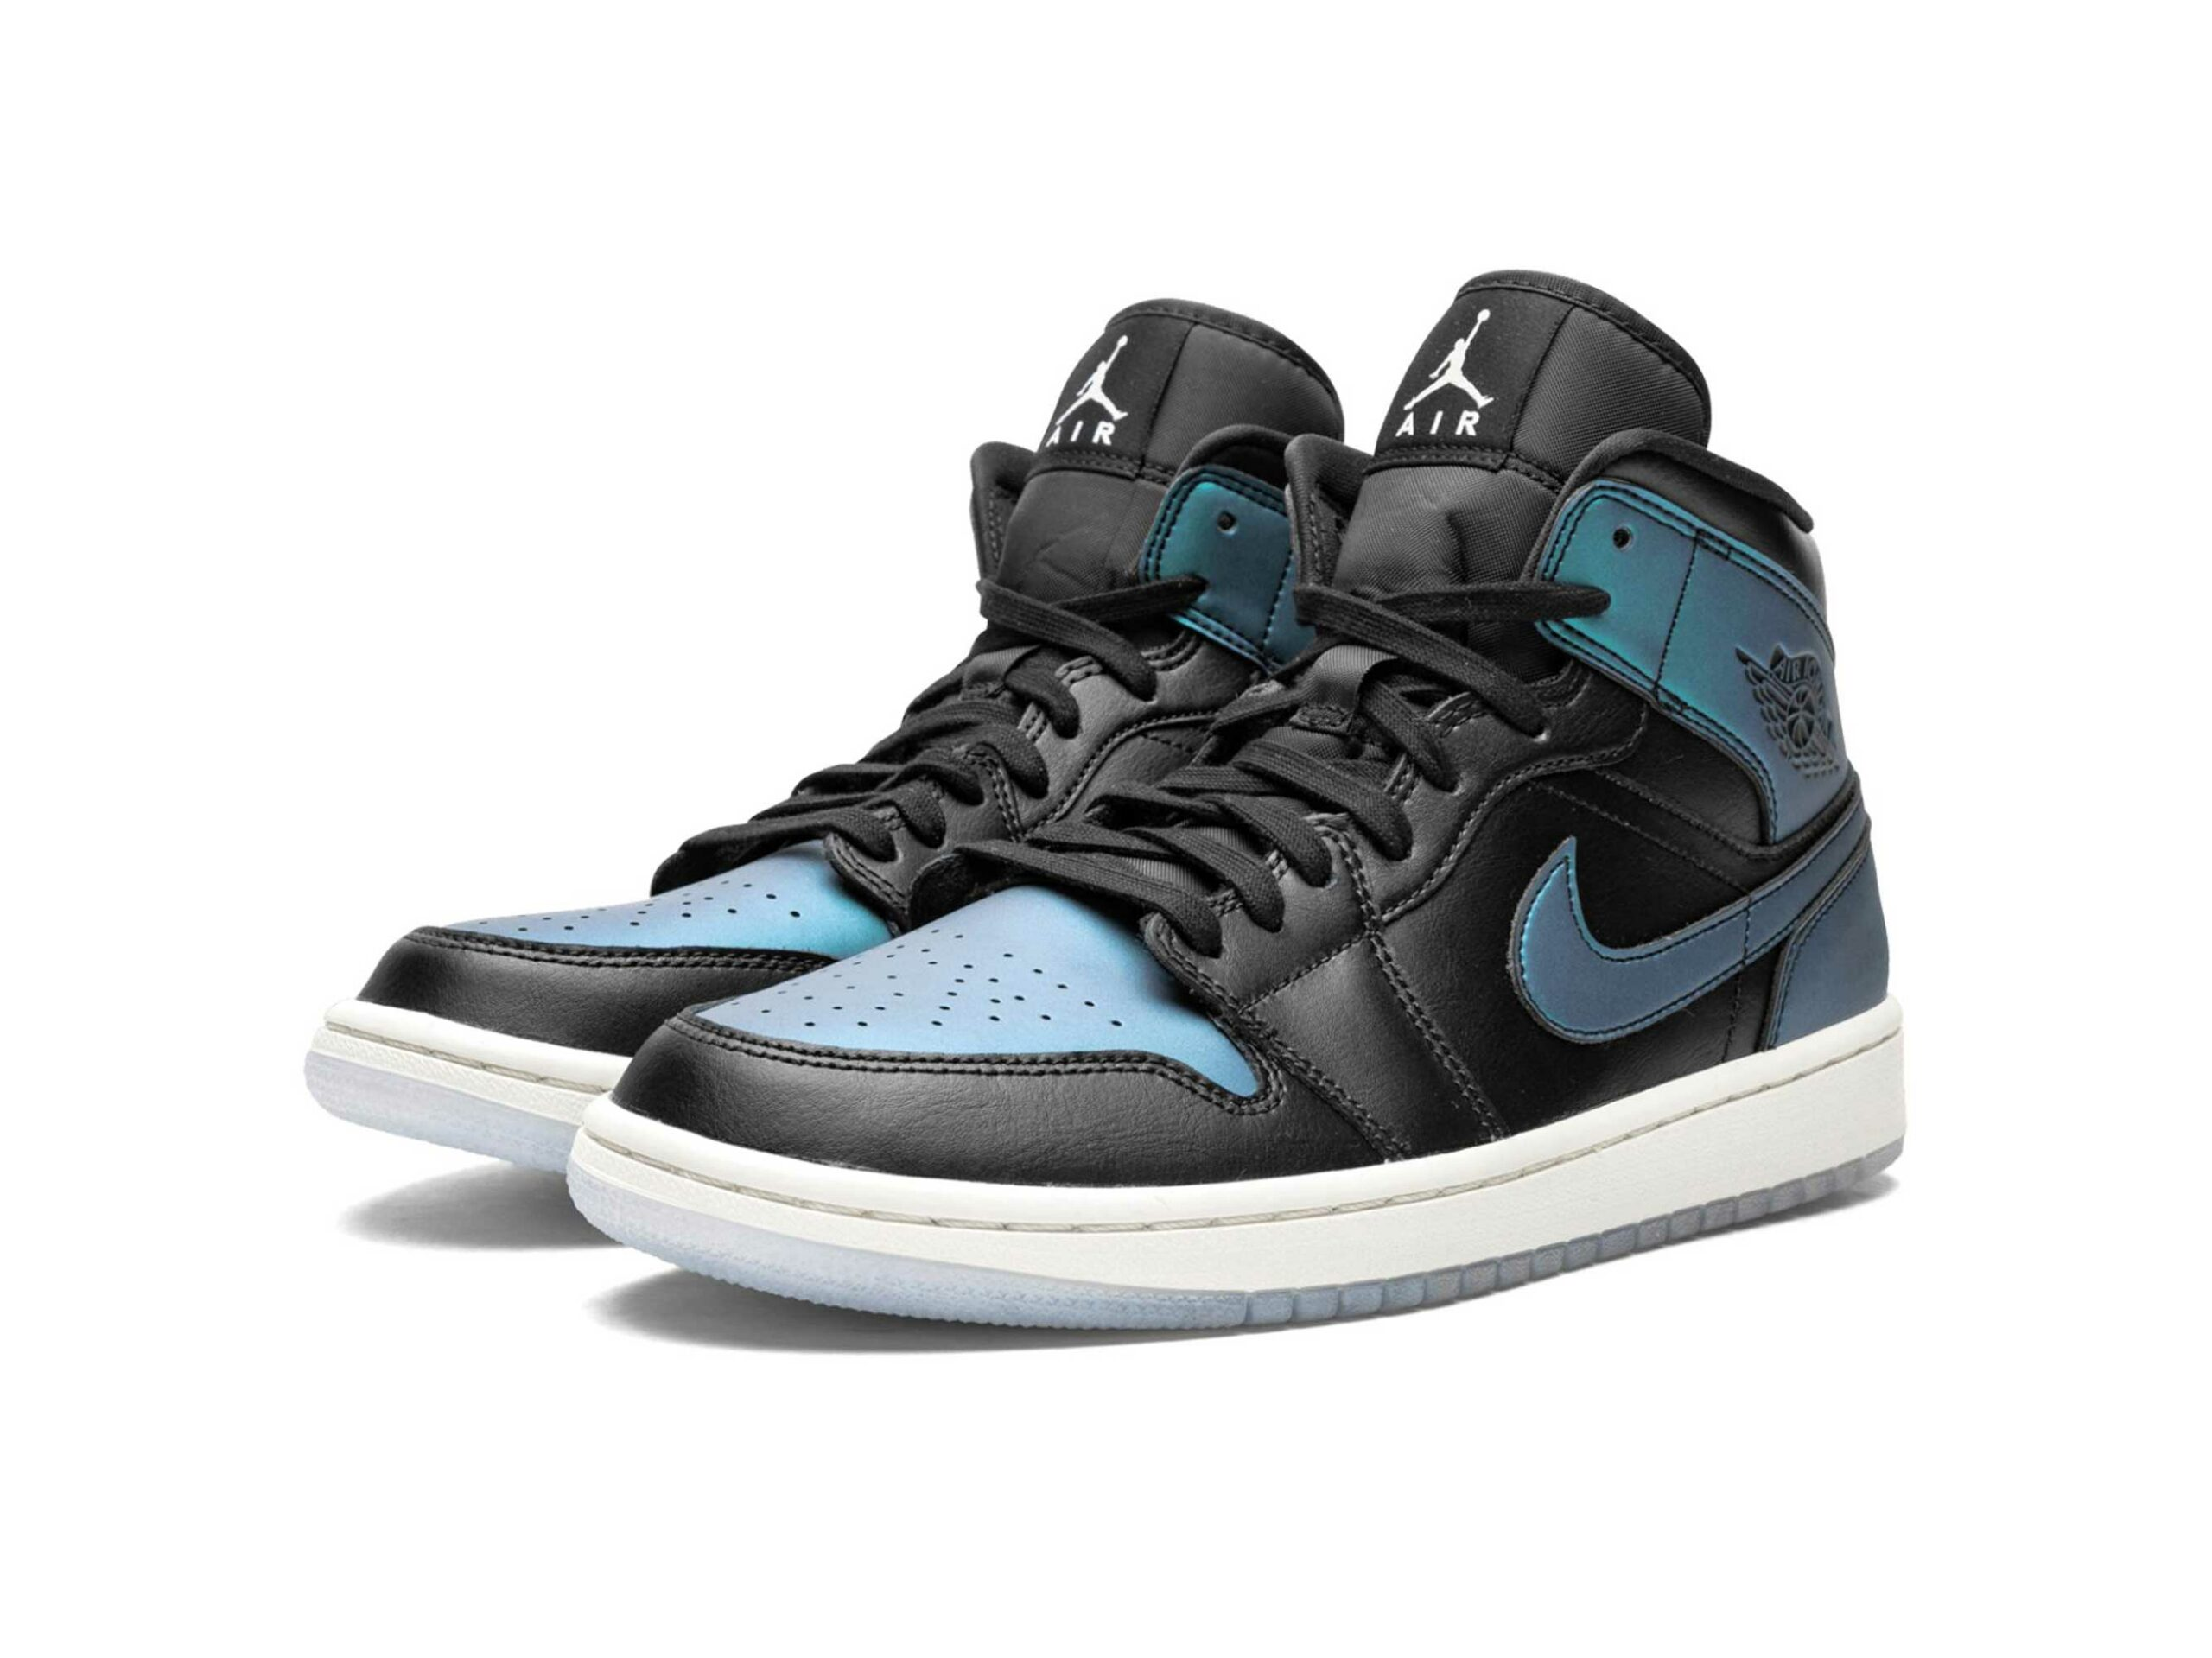 nike air Jordan 1 mid iridescent BQ6472_009 купить